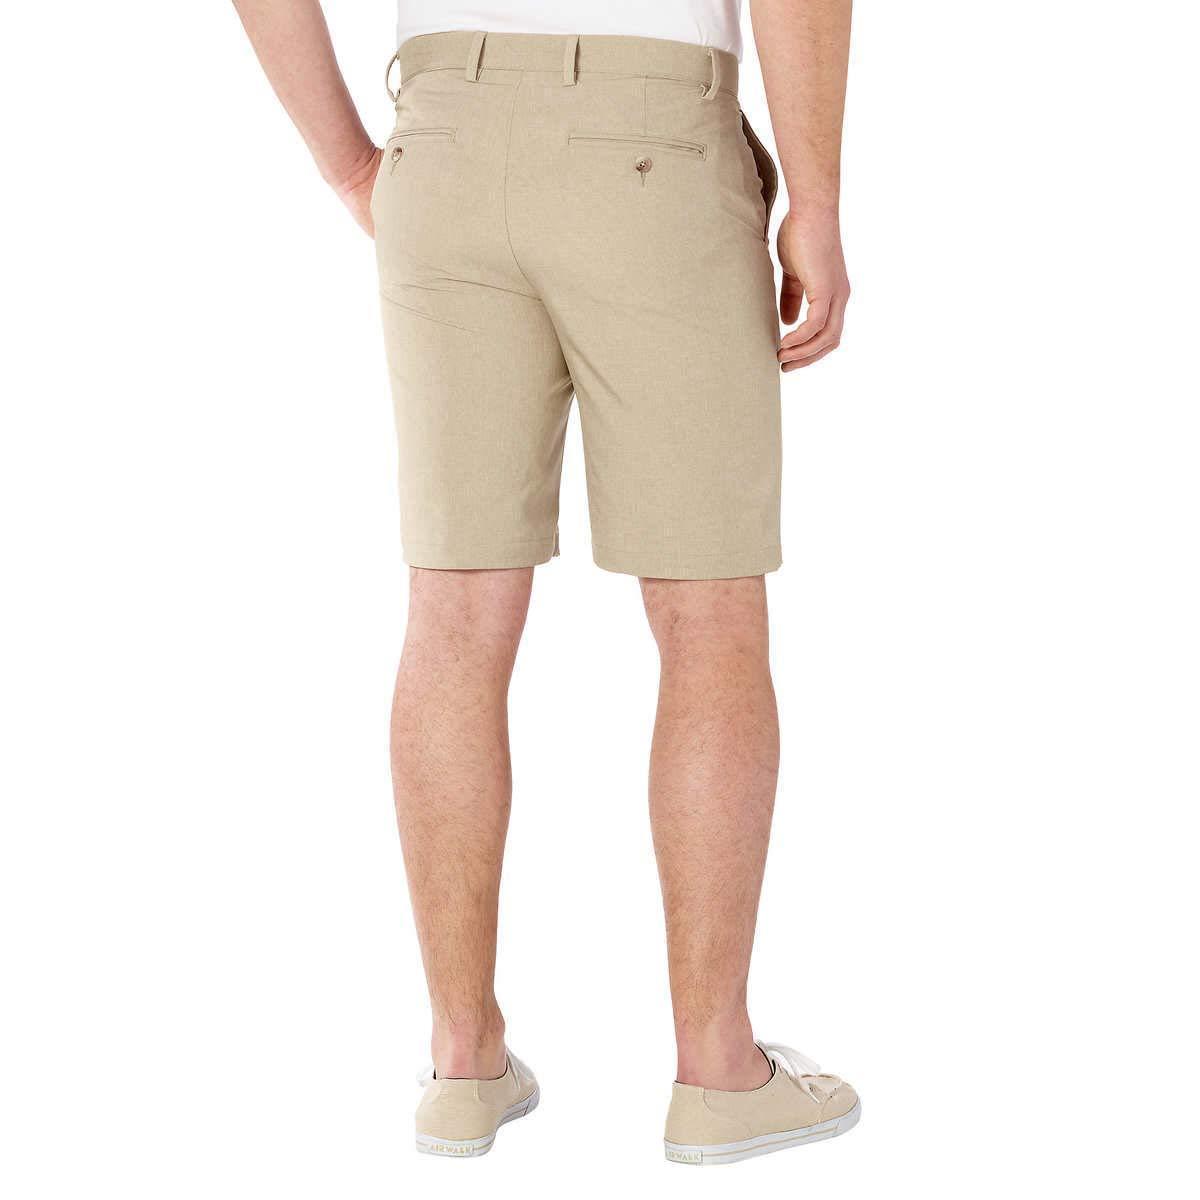 Greg Norman Signature Series Golf Shorts  , Color: Bamboo Tan Heathered